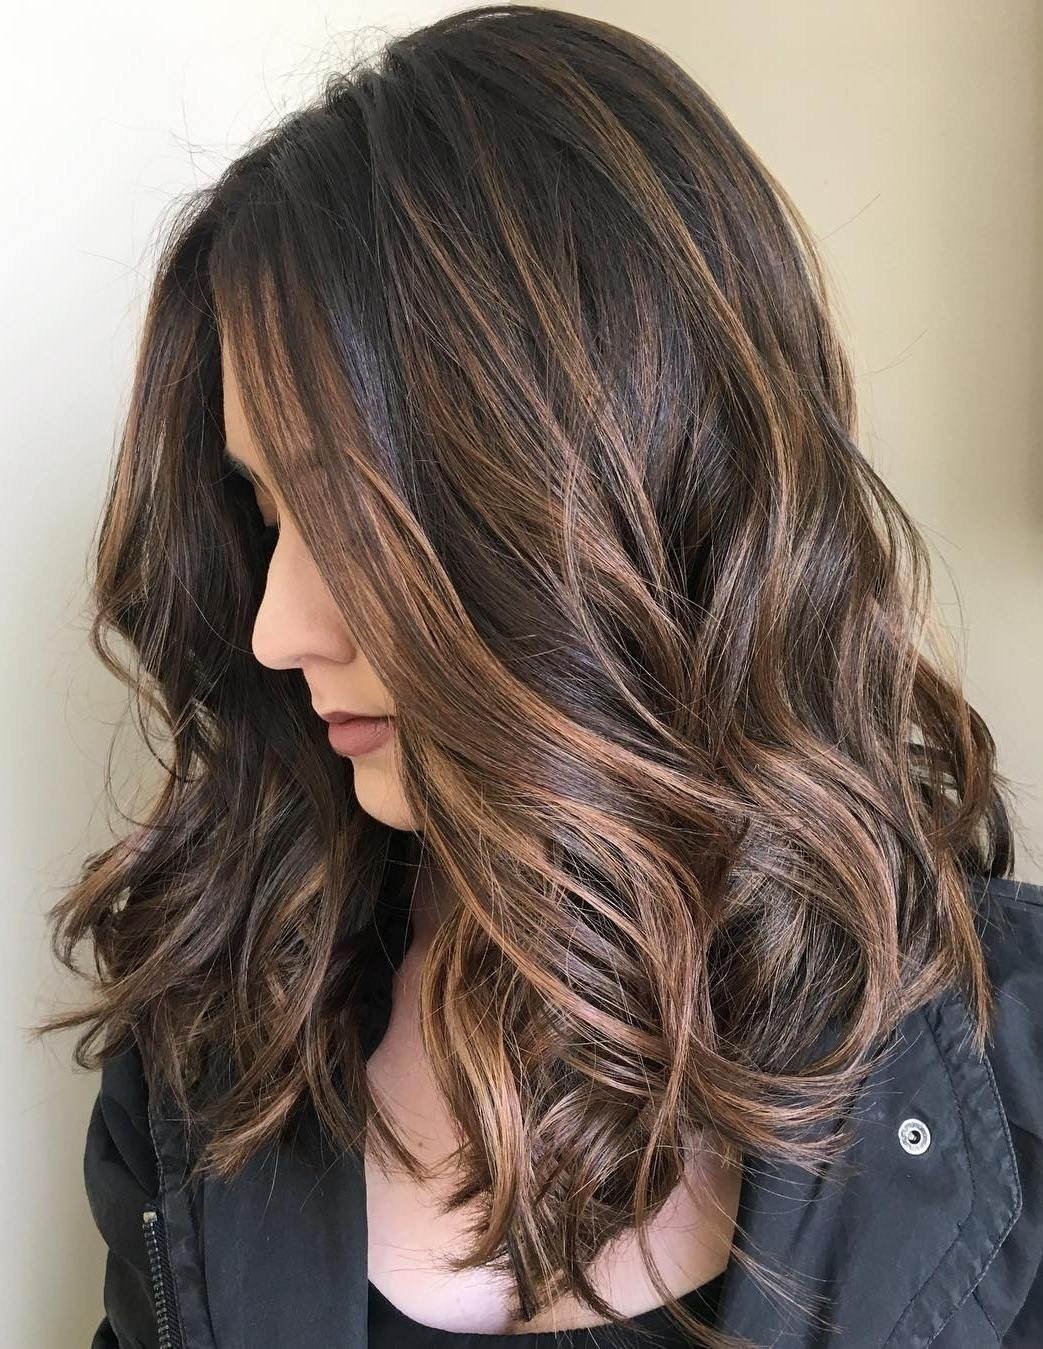 10 Stunning Hair Highlight Ideas For Brown Hair 70 flattering balayage hair color ideas for 2018 3